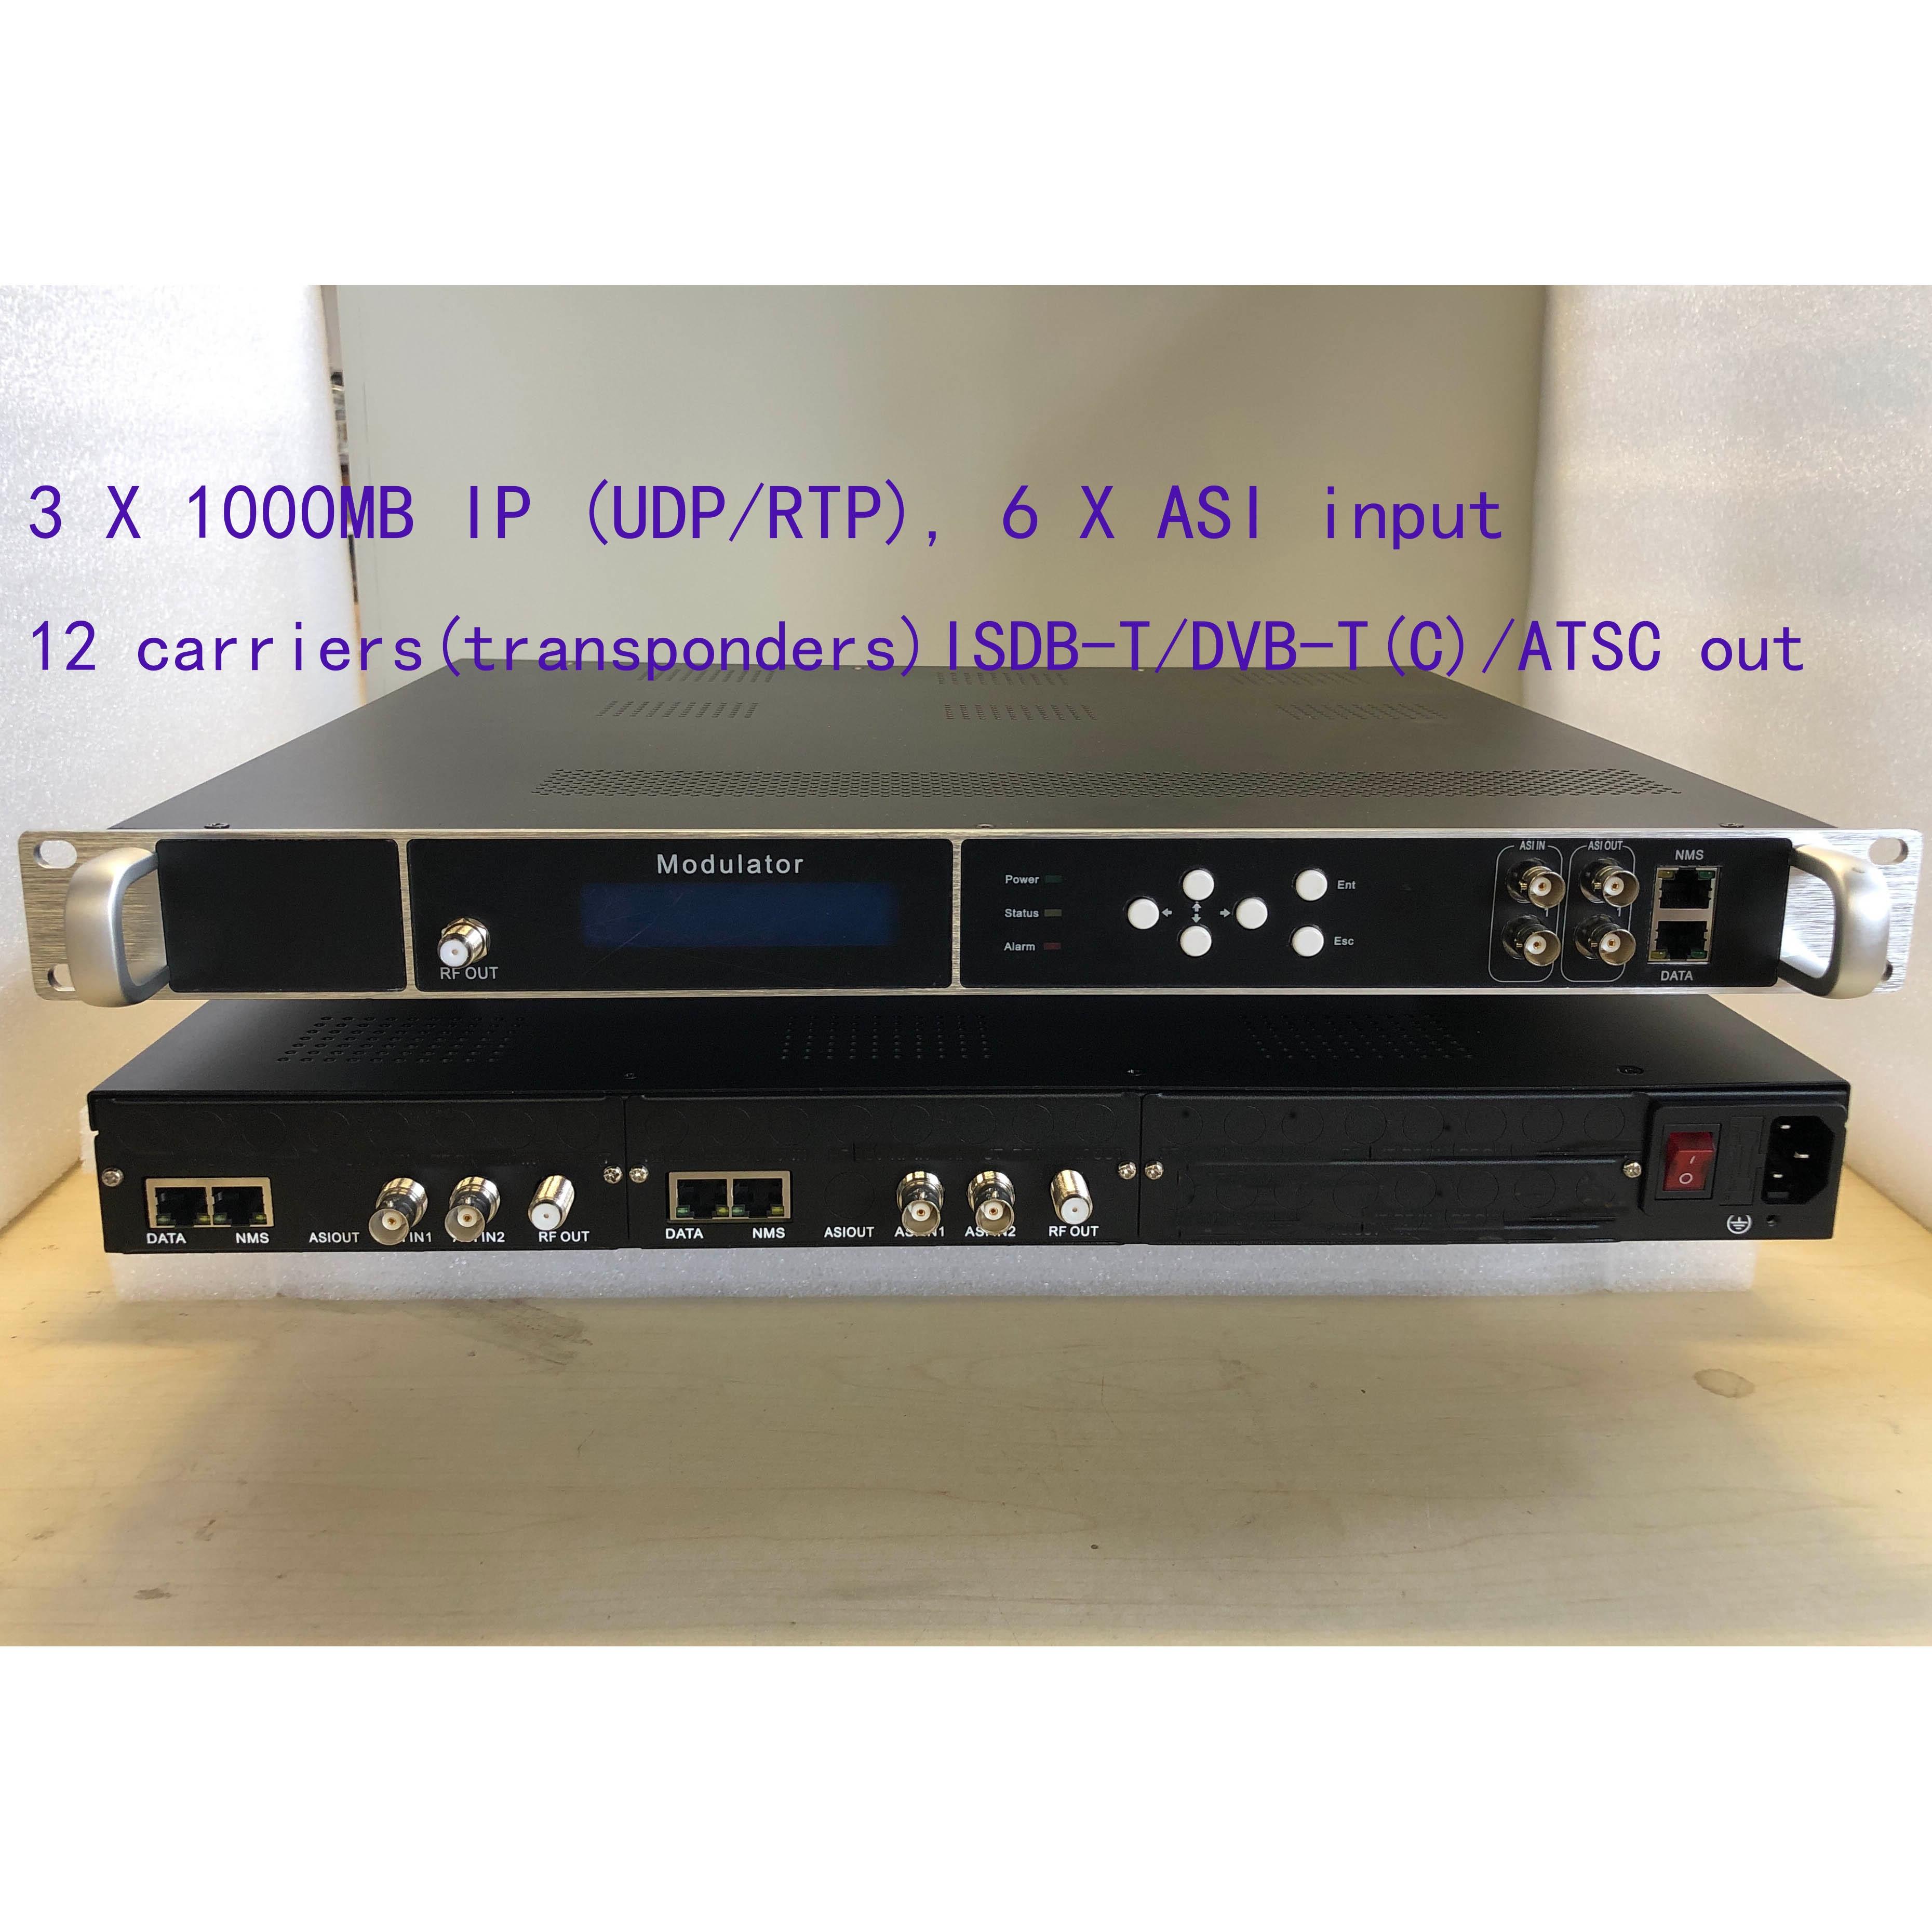 12 soportes de modulador digital ATSC, giga IP a modulador ATSC, catv modulador digital, con salida 2 ASI